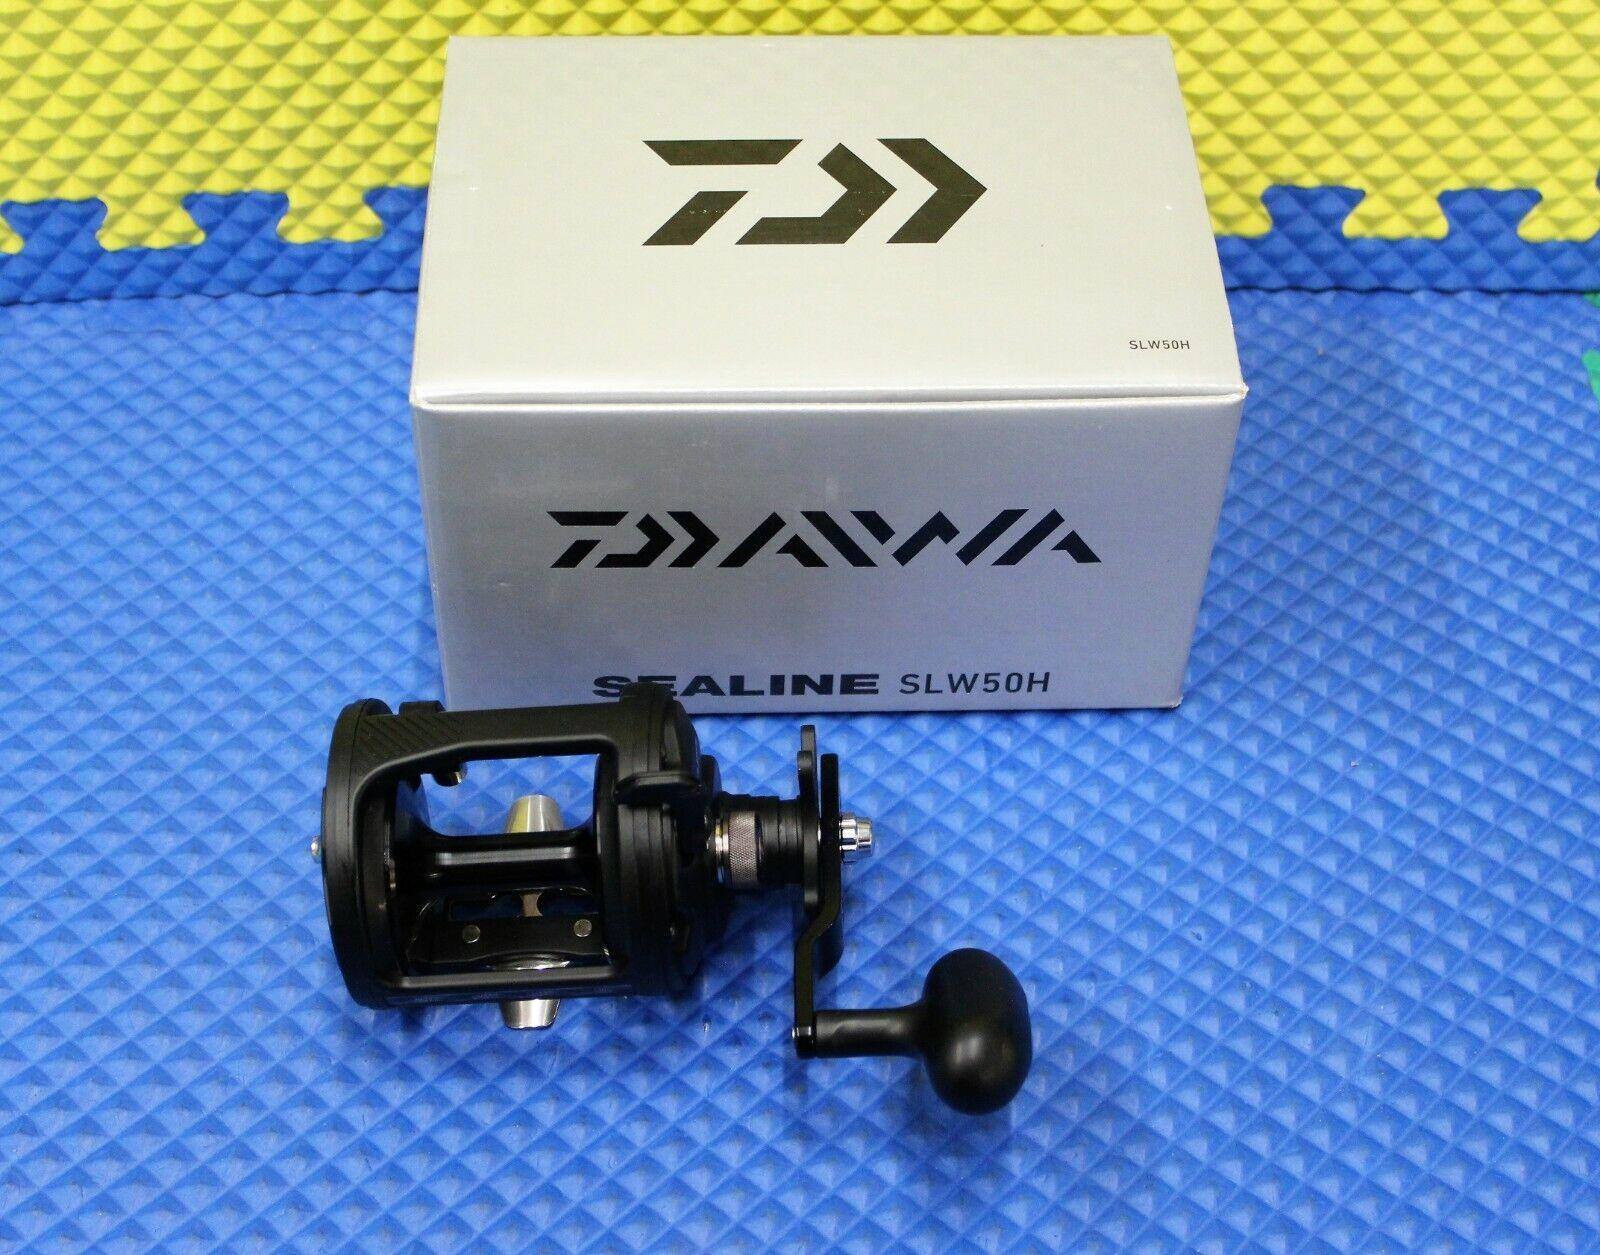 Daiwa Sealine SLW Levelwind Reel SLW50H